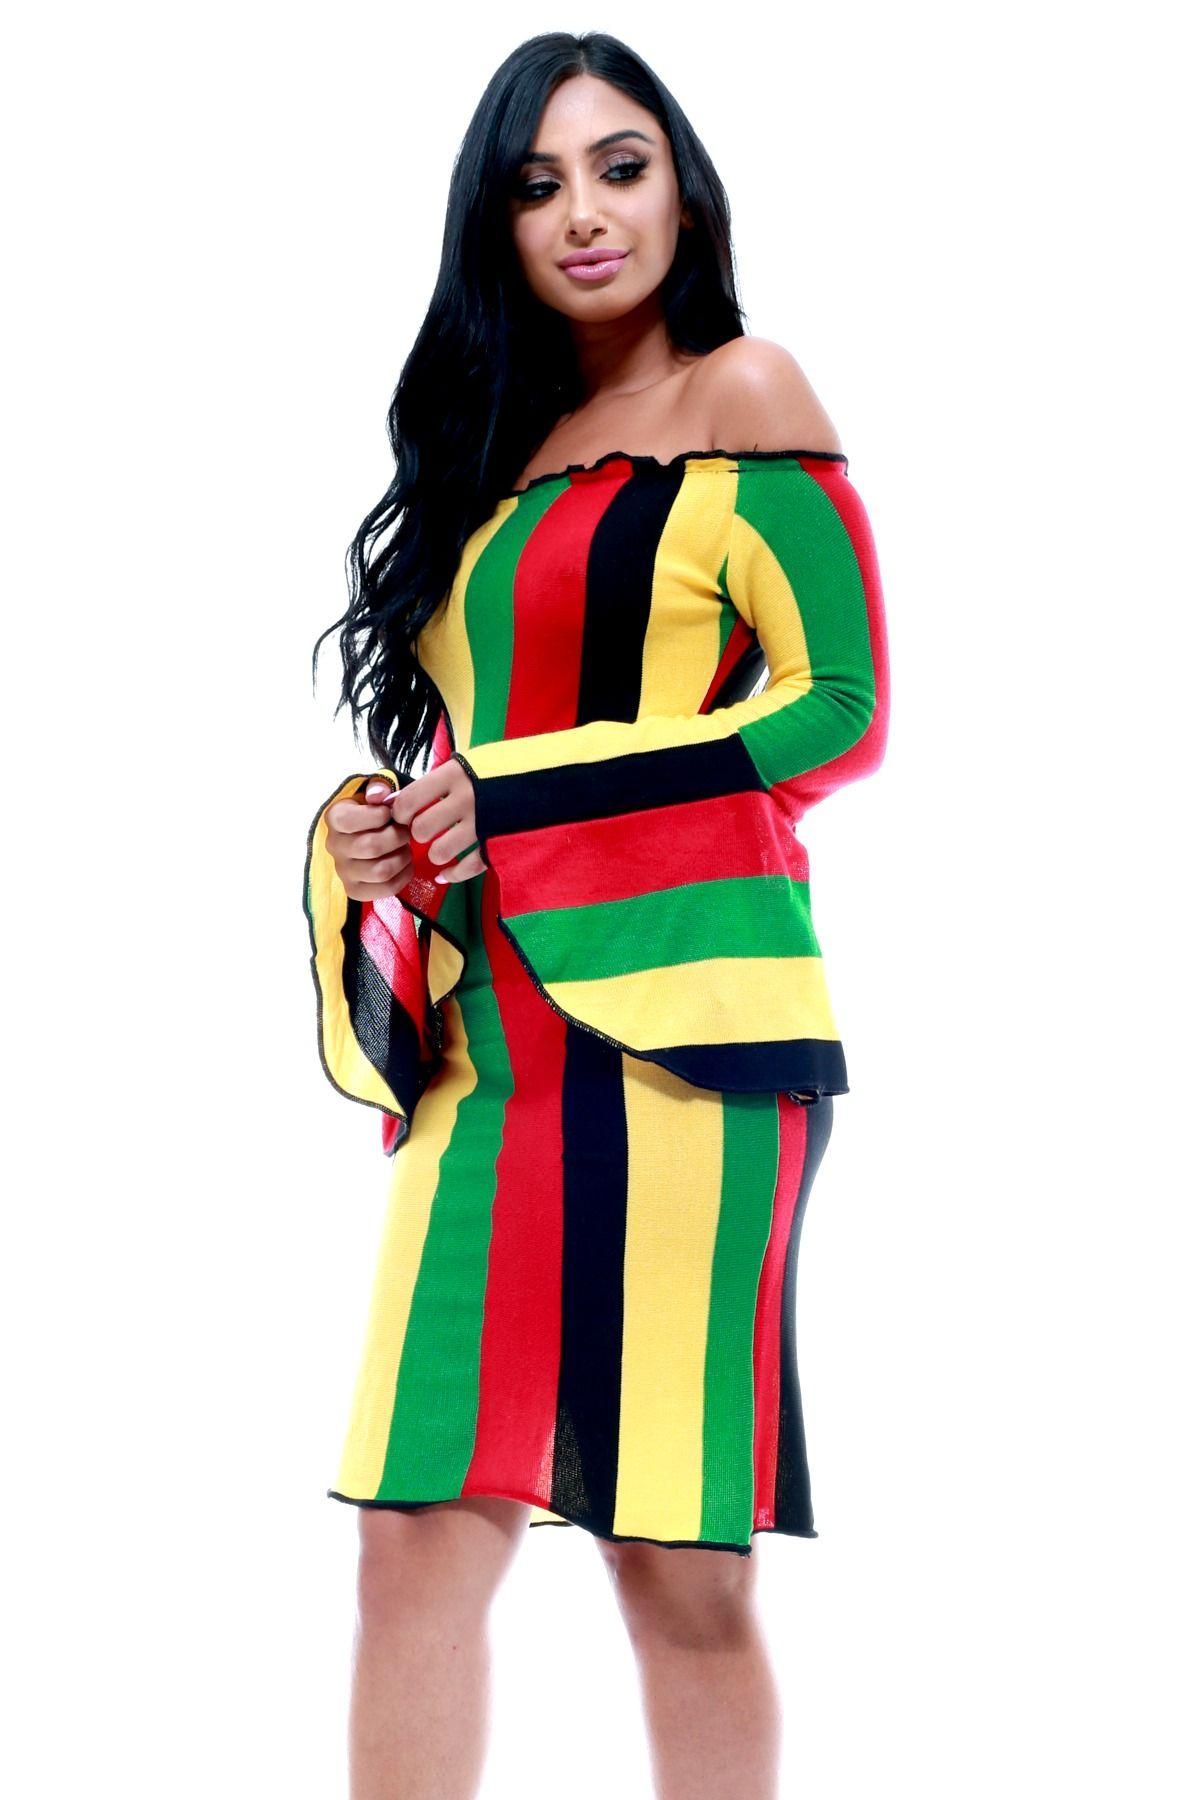 b52a1b986311ce Rasta Dress Jamaican Clothing Trend is Back - Fifth Degree